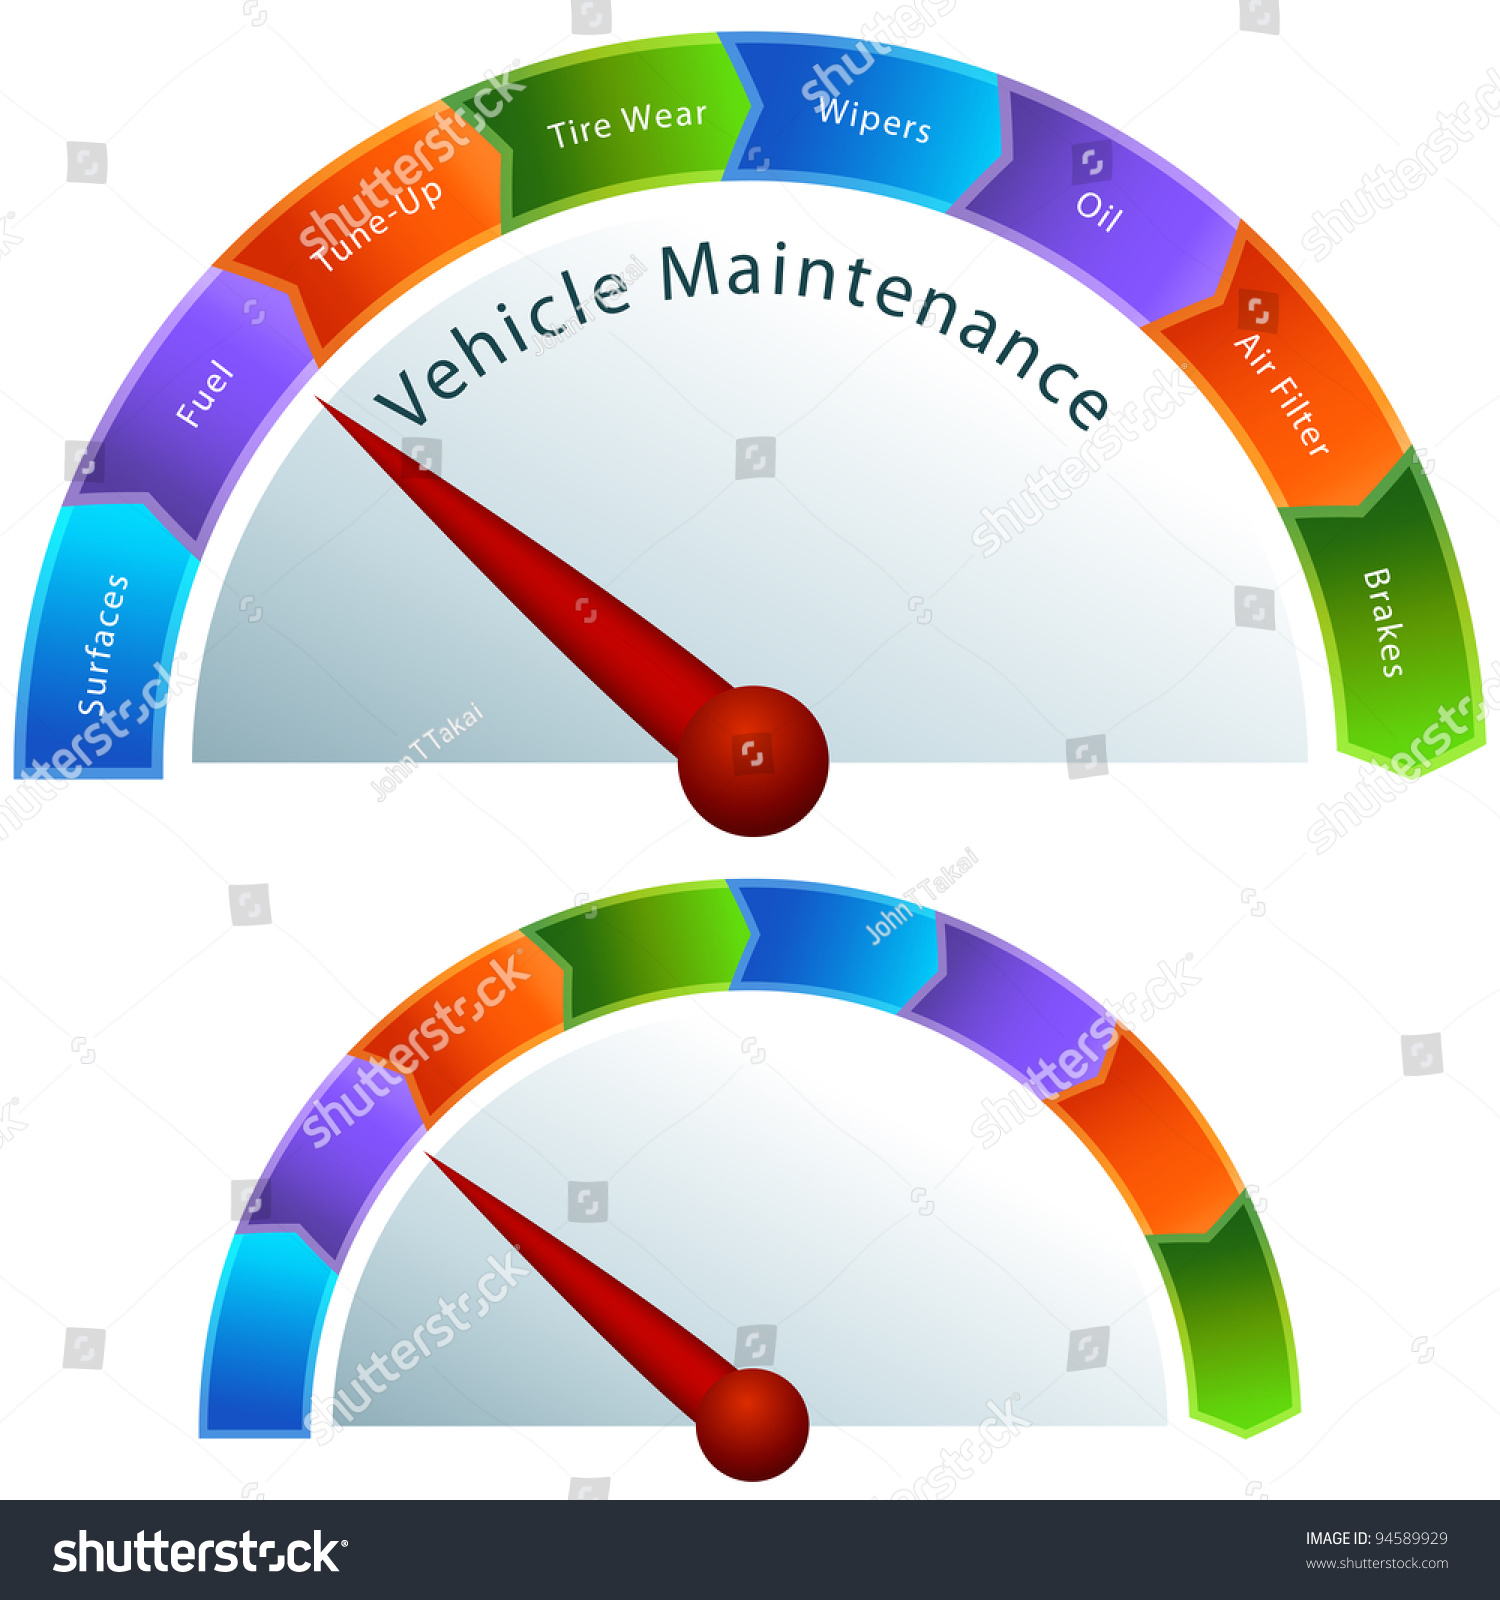 image vehicle maintenance chart stock vector 94589929